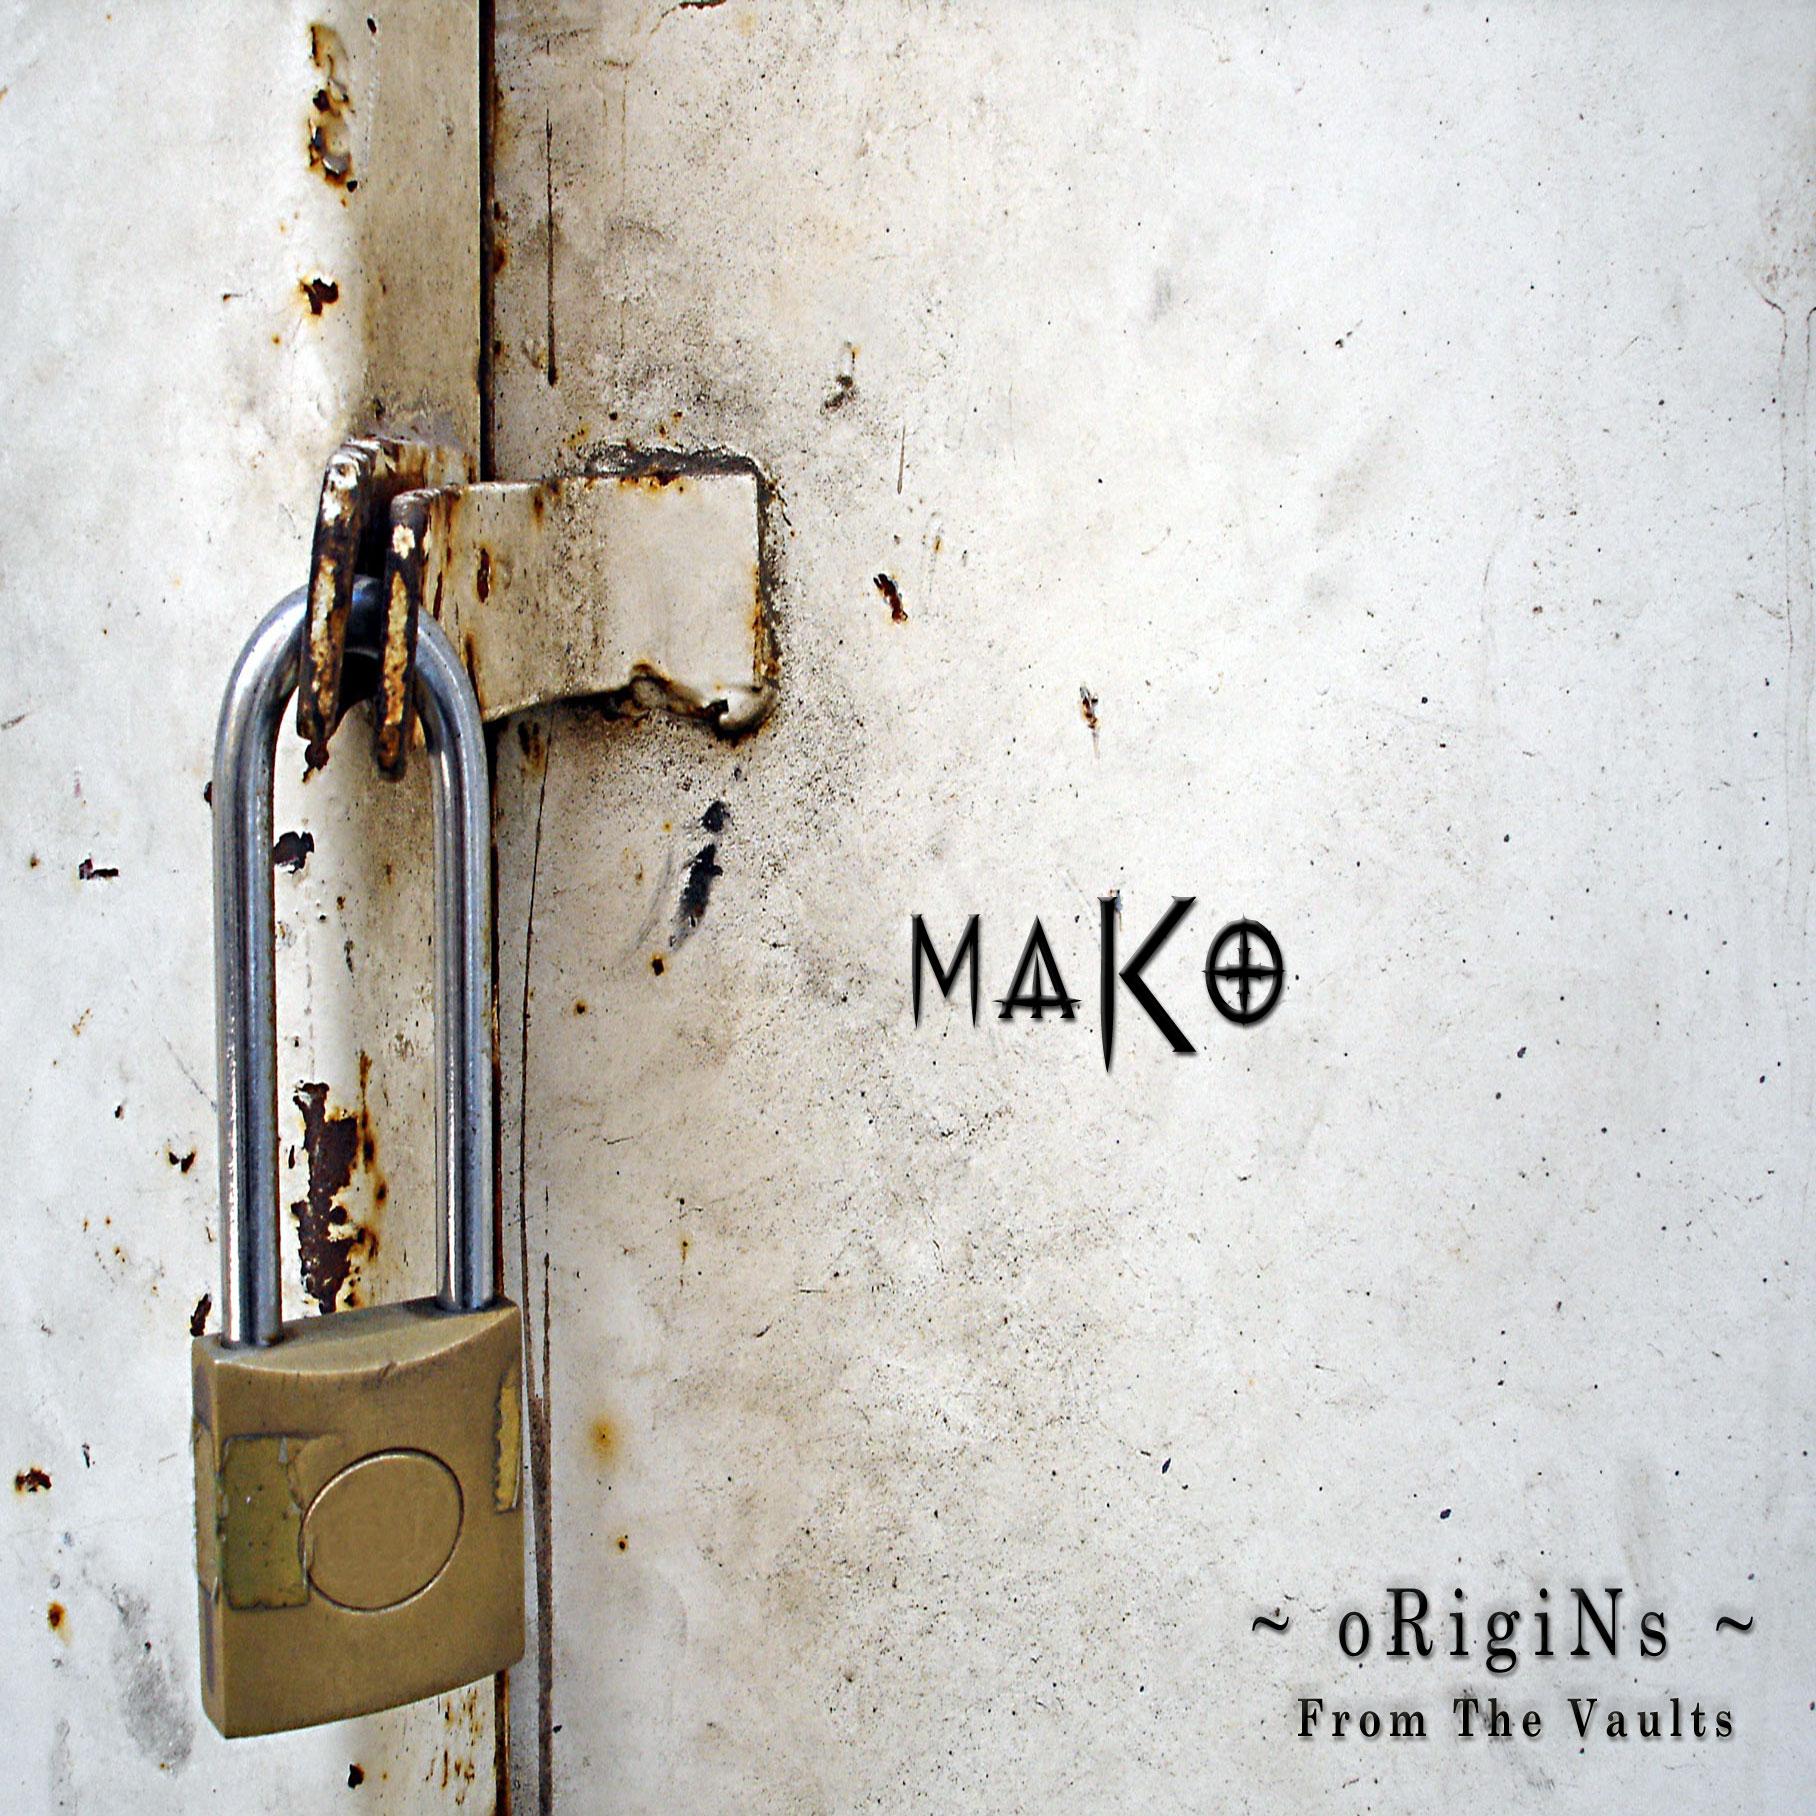 maKo oRigiNs old cover